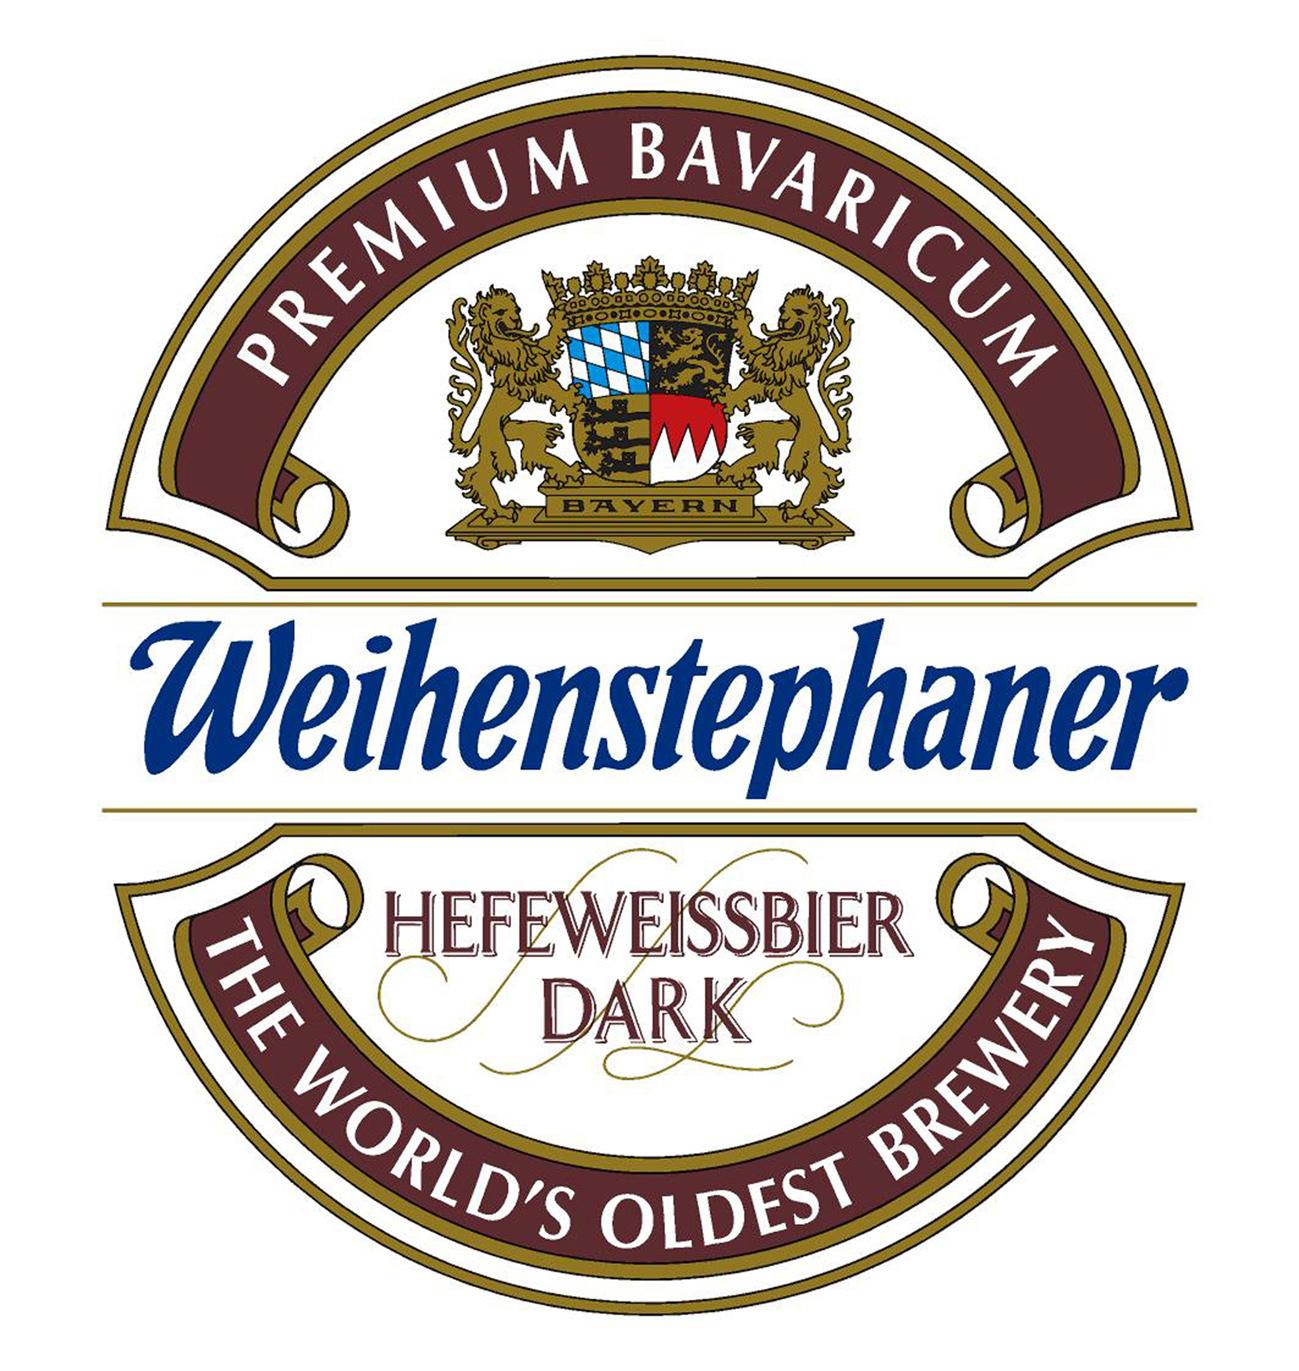 Weihenstephaner Hefeweissbier Dunkel Image